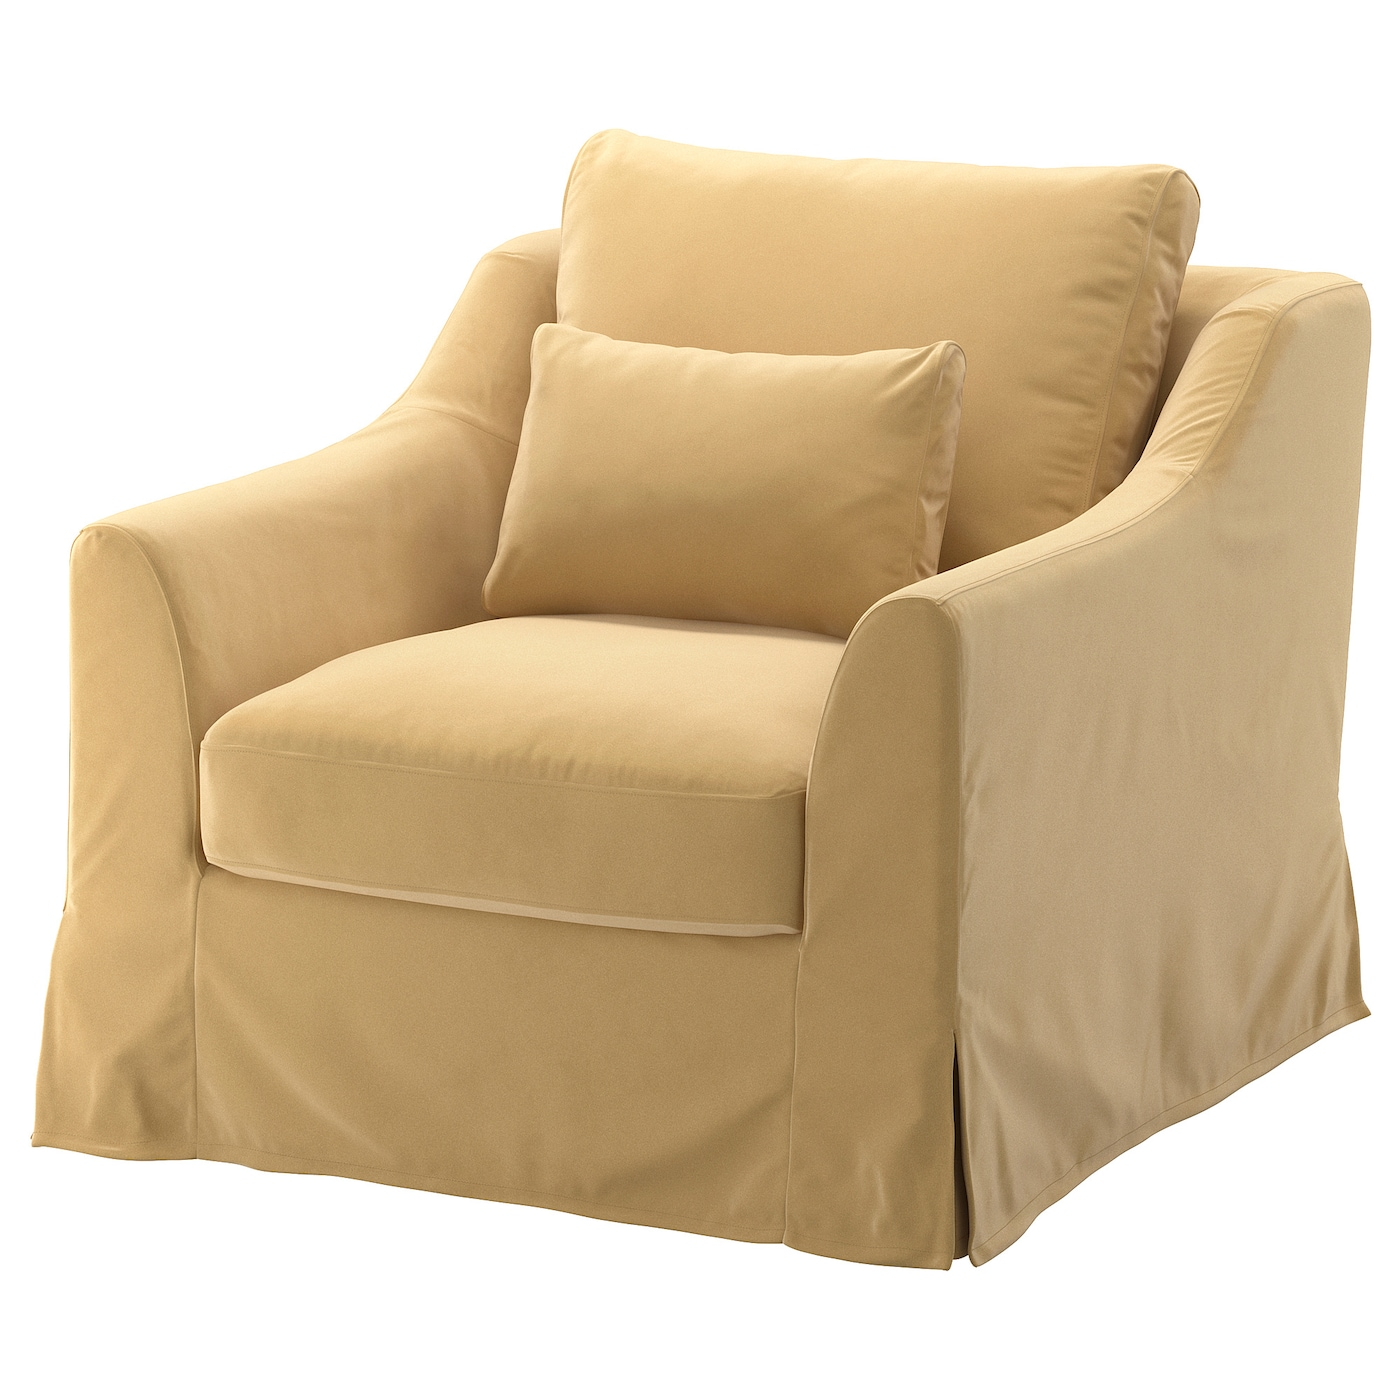 fauteuils en tissu ikea. Black Bedroom Furniture Sets. Home Design Ideas